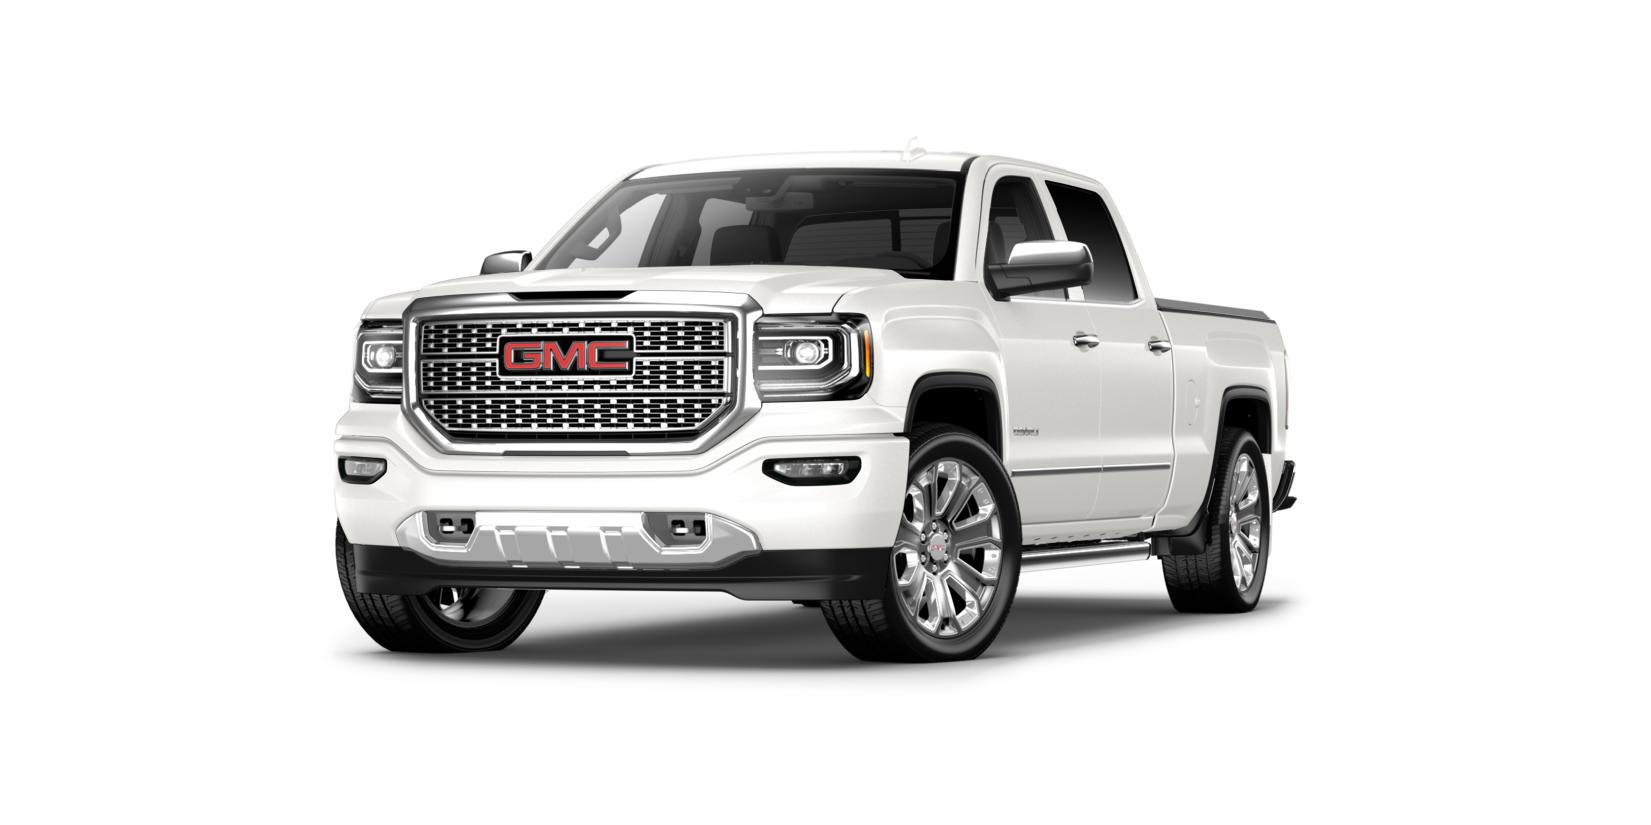 most expensive truck - sierra-1500-denali